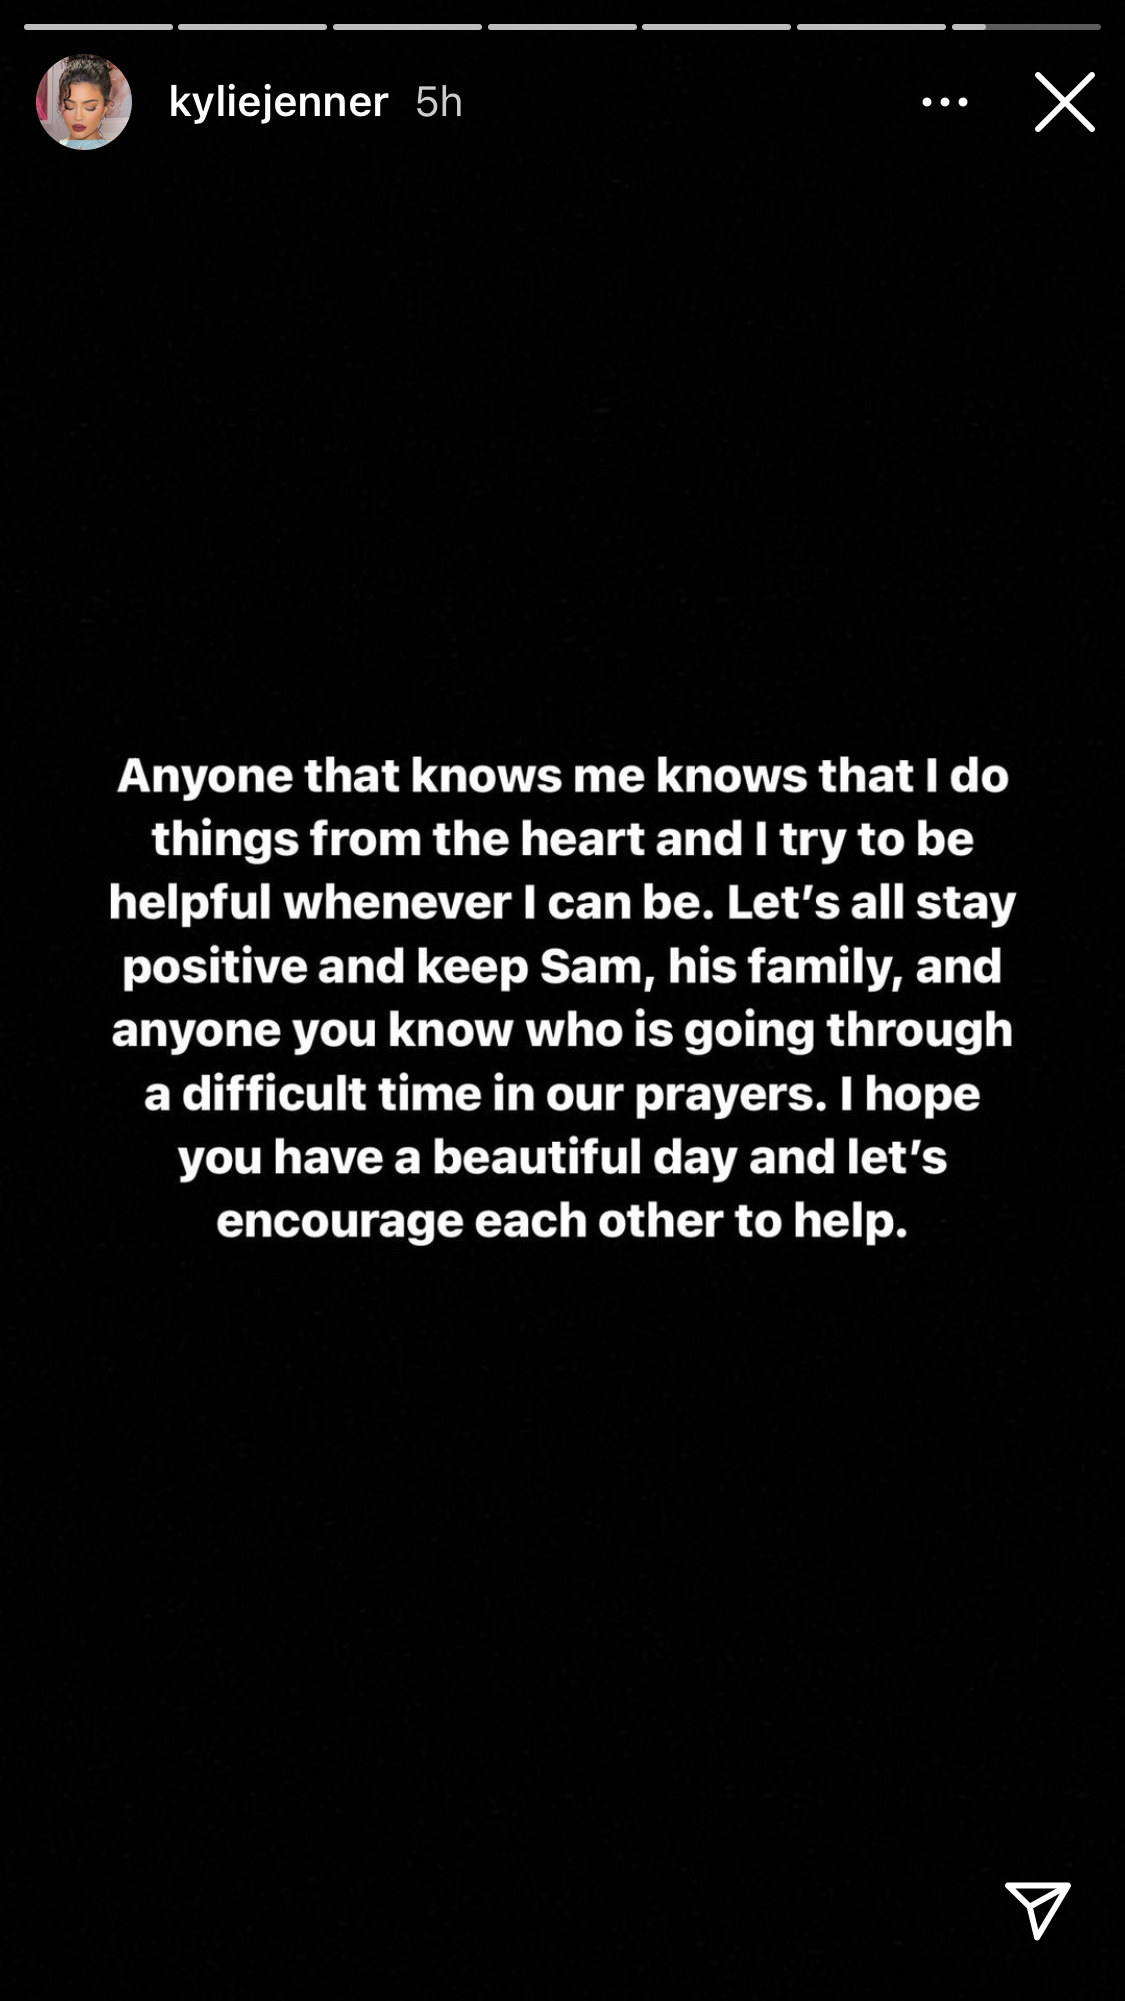 A screenshot of Kylie Jenner's Instagram Story further clarifying details surrounding when she shared Samuel Rauda's GoFundMe